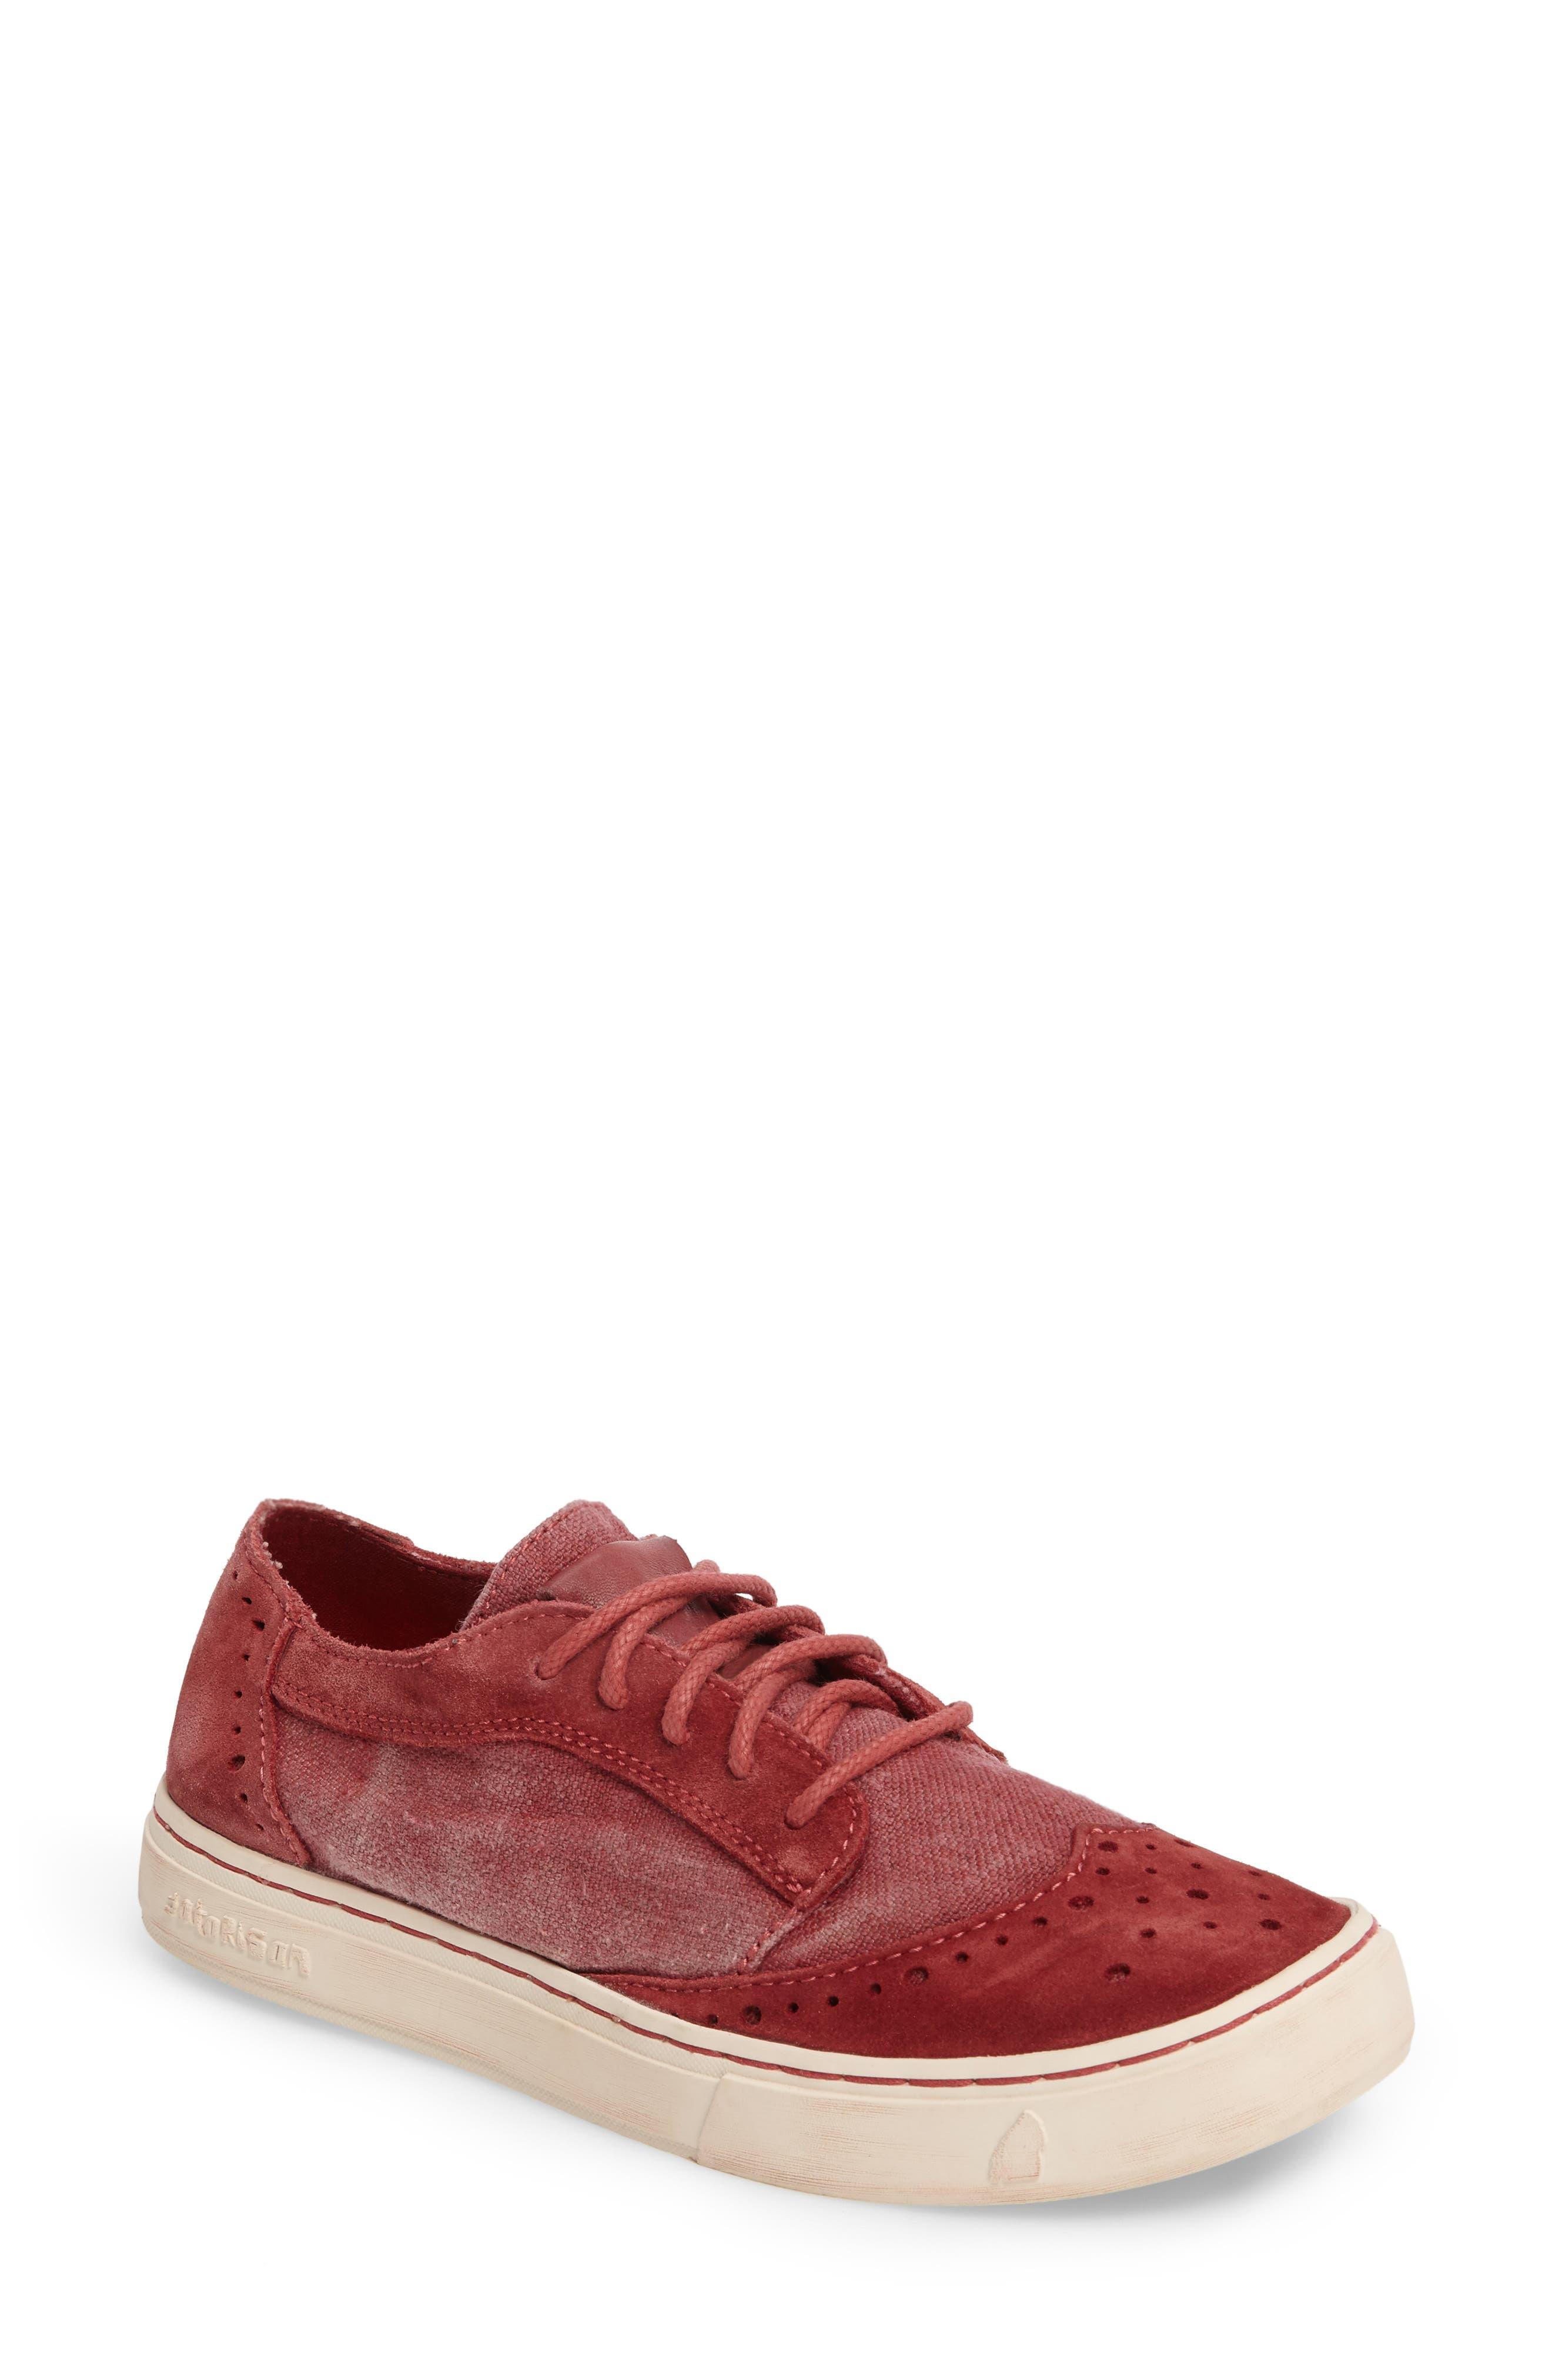 Yukai Sneaker,                             Main thumbnail 1, color,                             Sandalwood